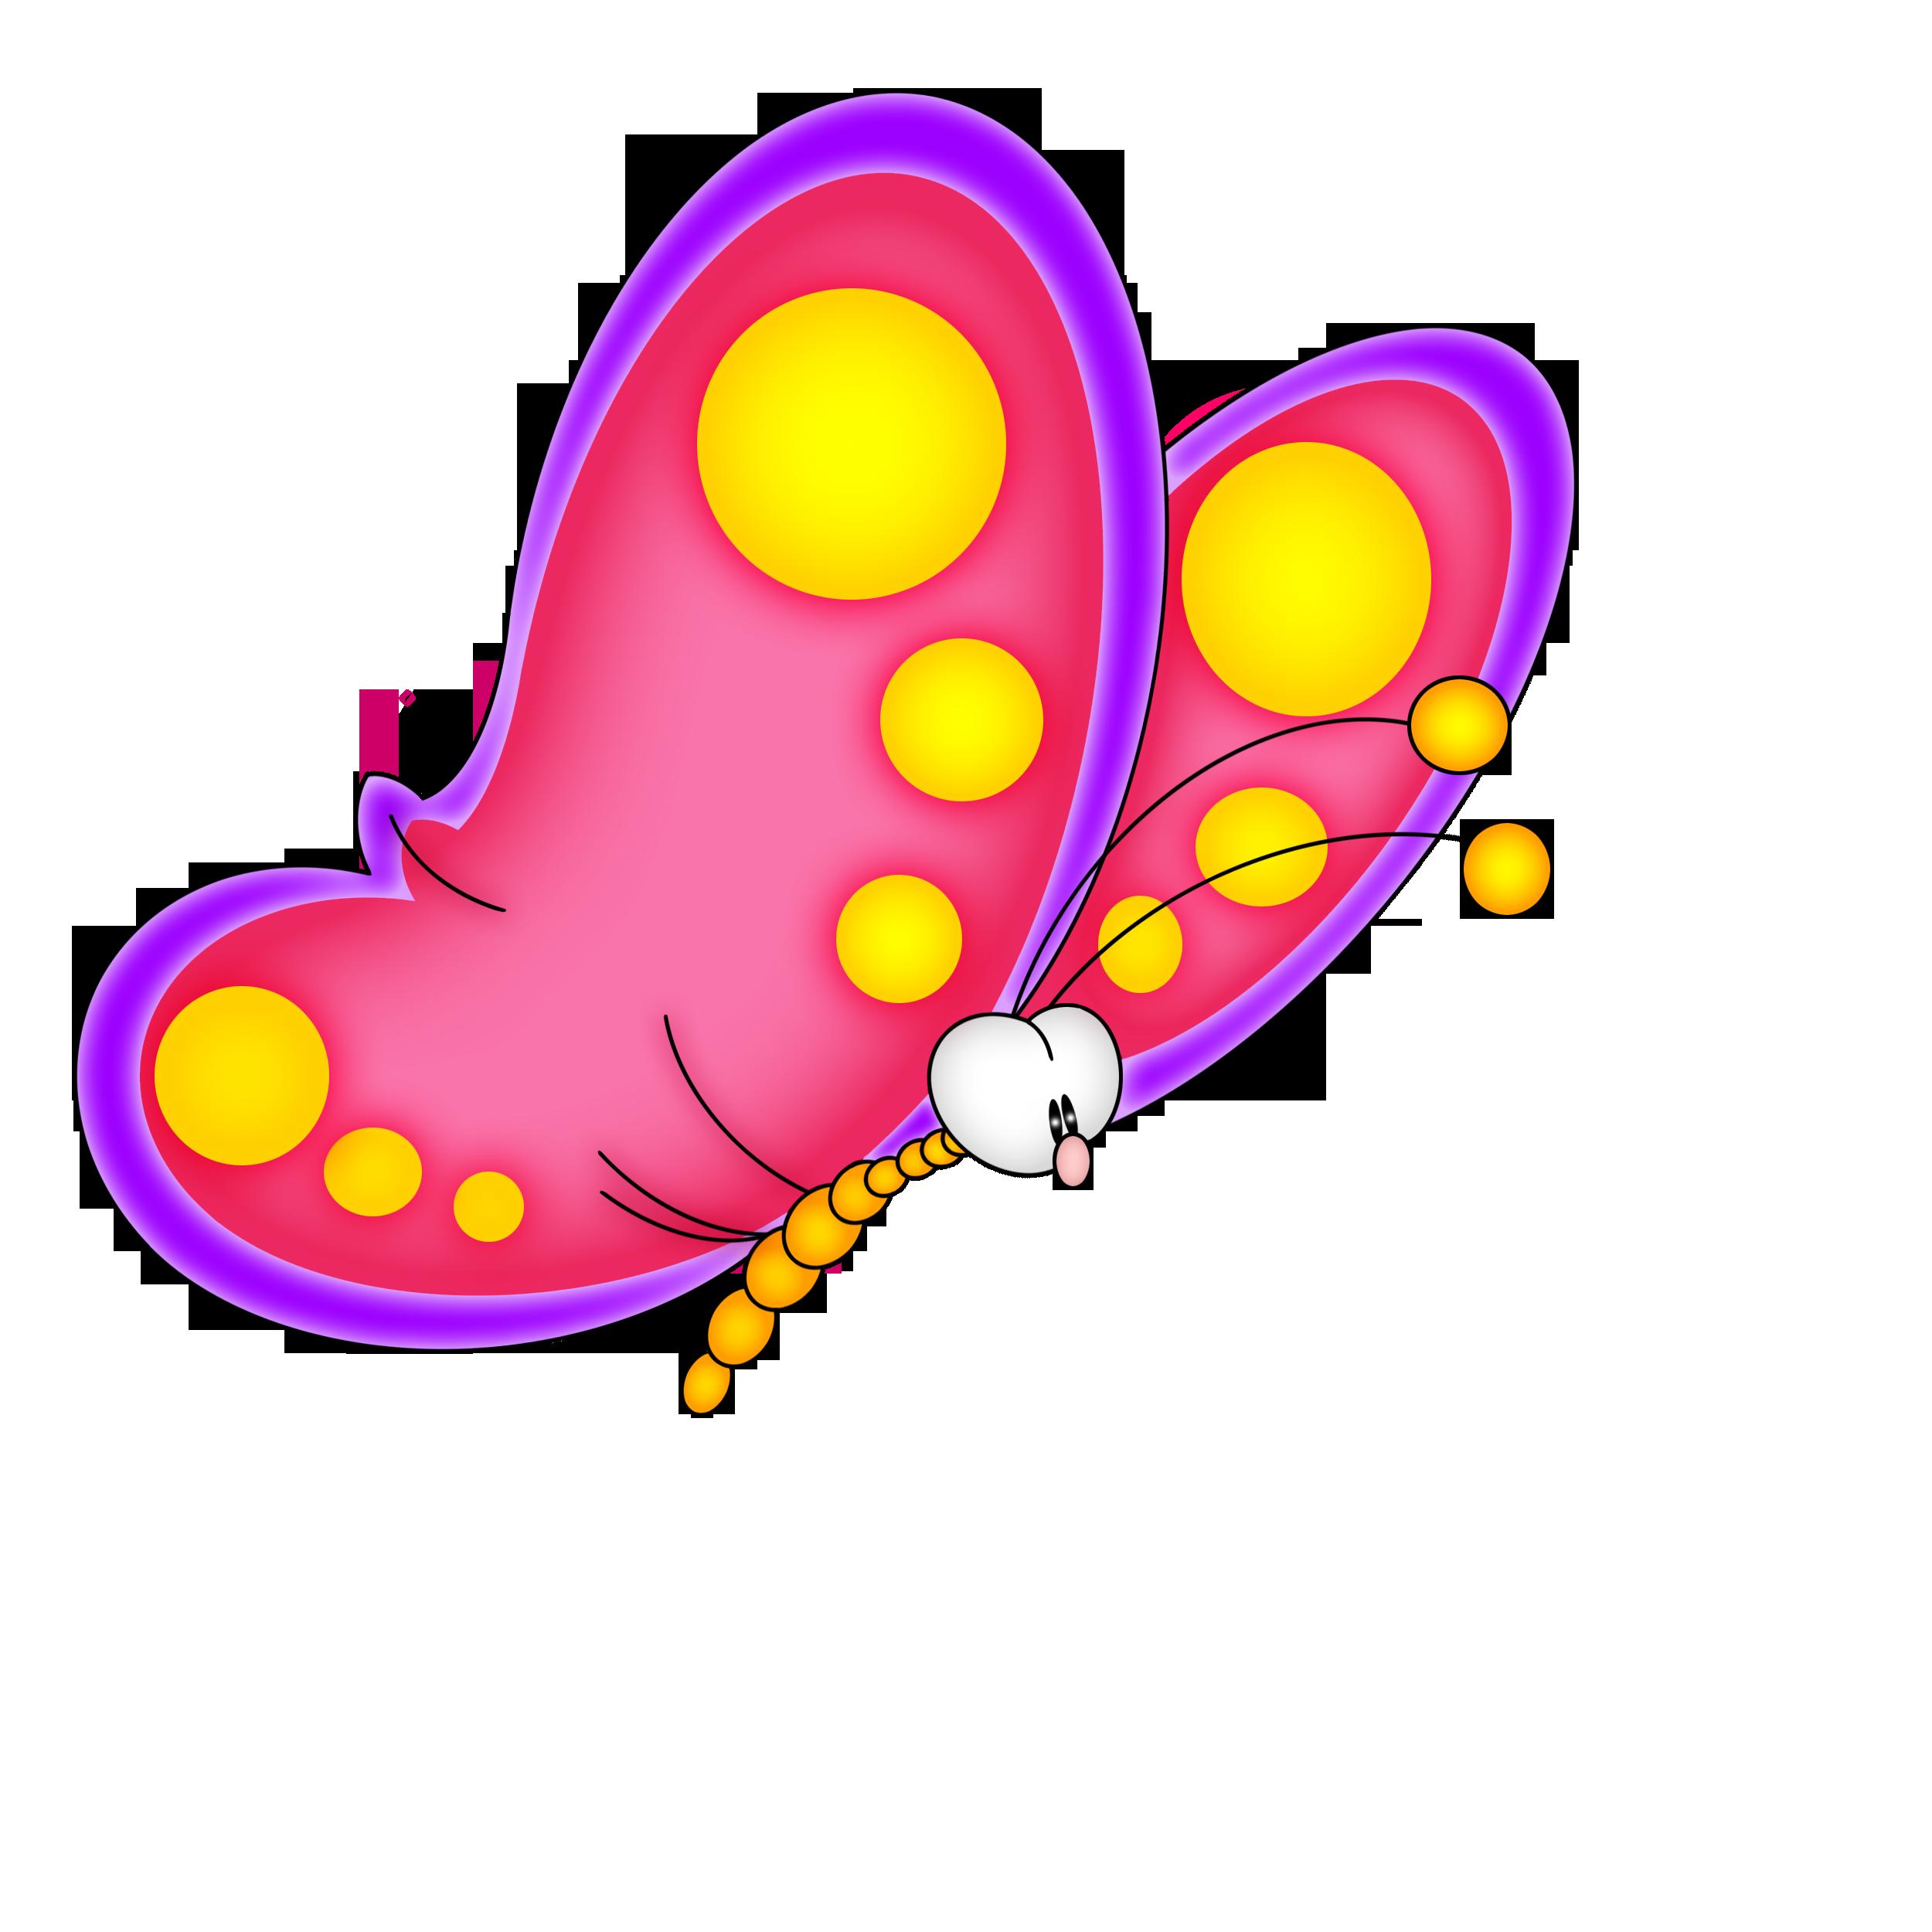 Animales infantiles mariposa - Imagenes animales infantiles ...